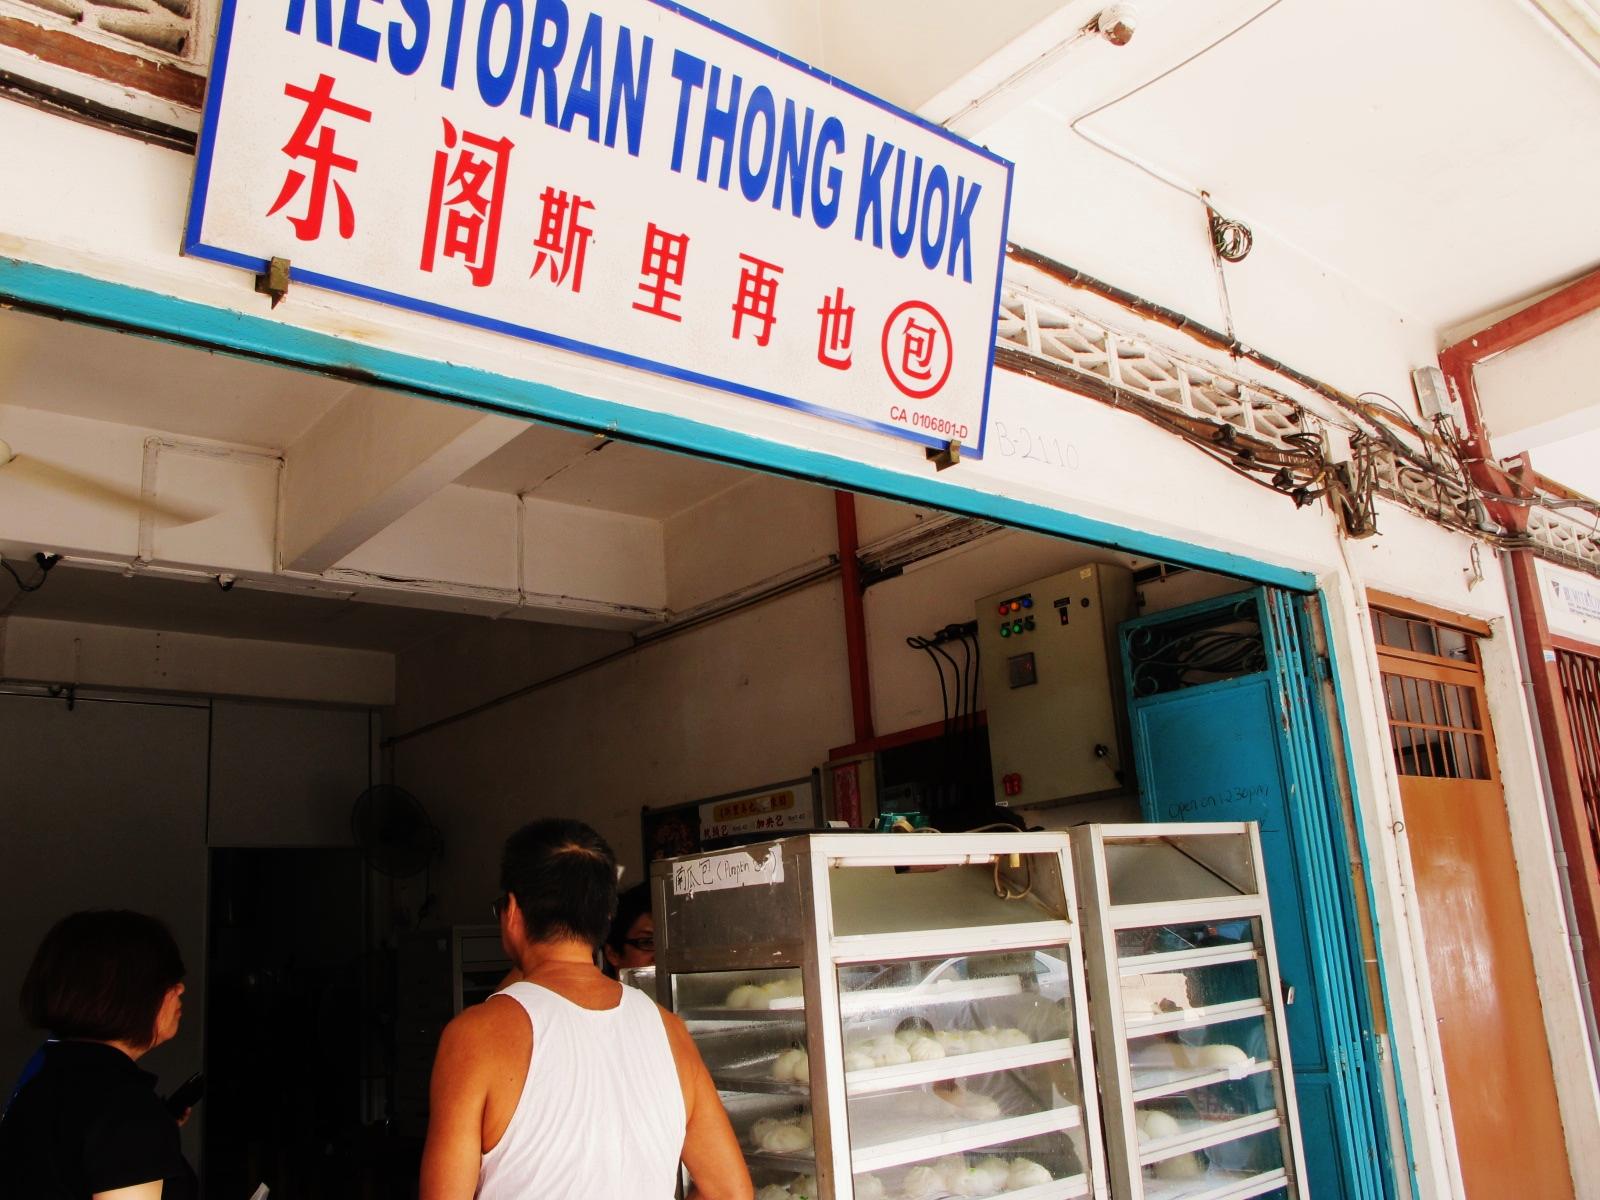 Image result for Restoran Thong Kuok